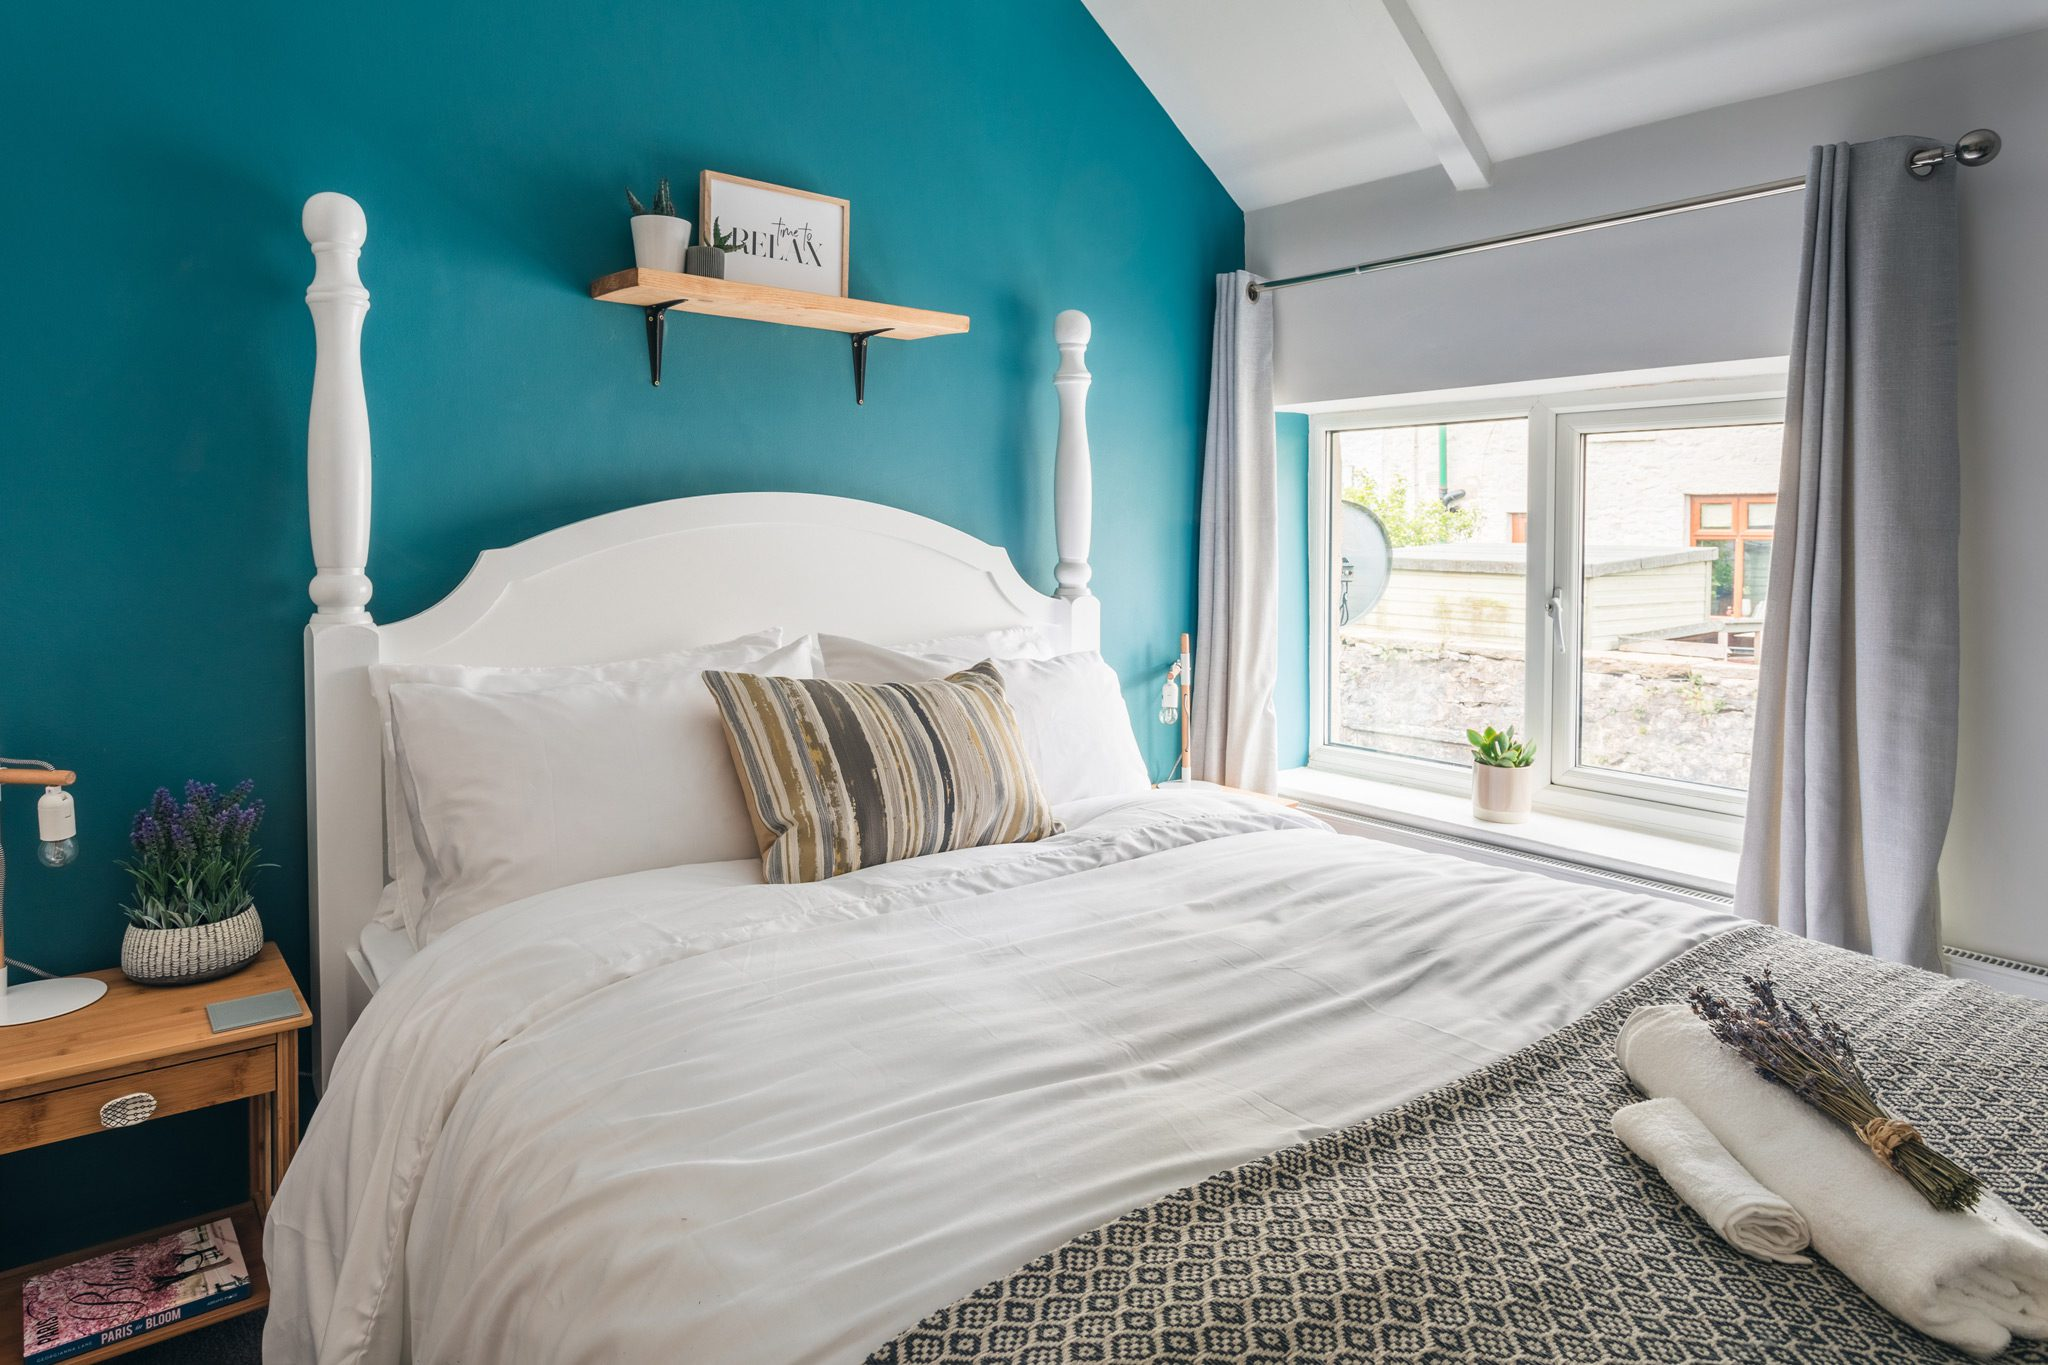 Luxury Property Photography - Master Bedroom